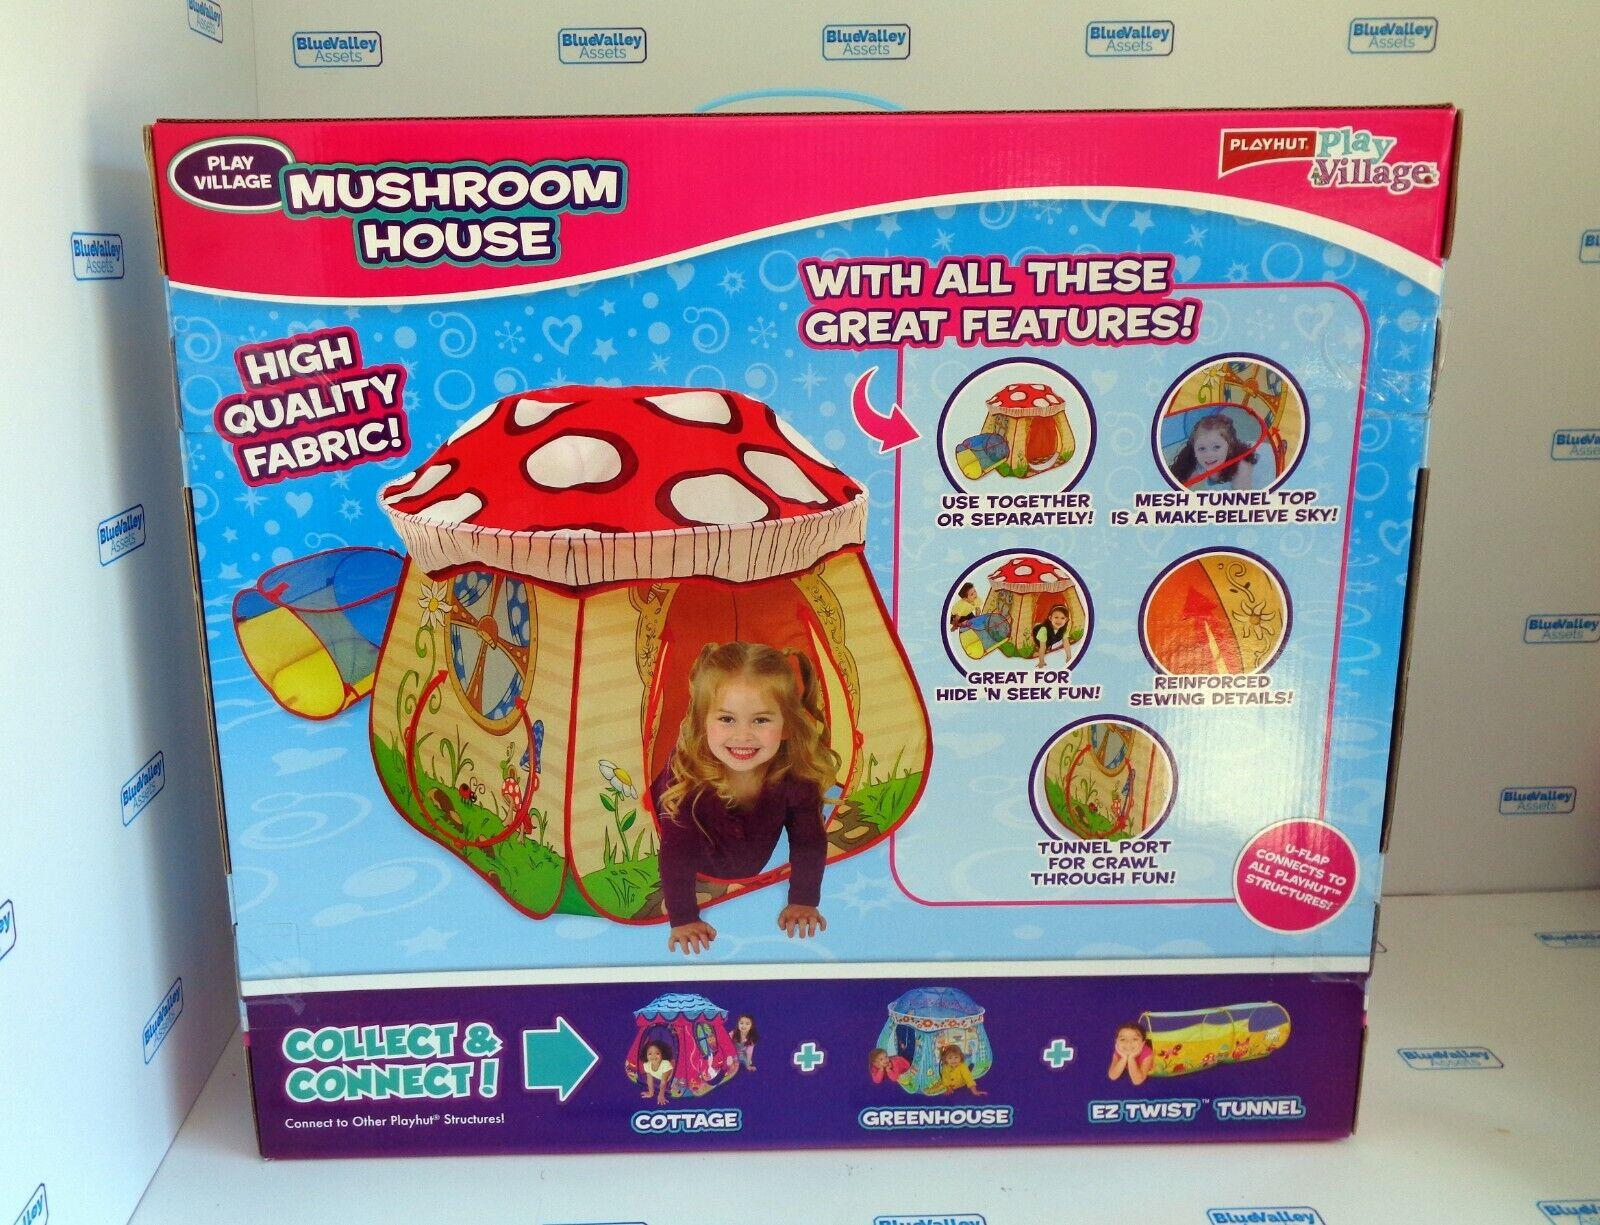 Playhut Play Village Mushroom House Play Tent